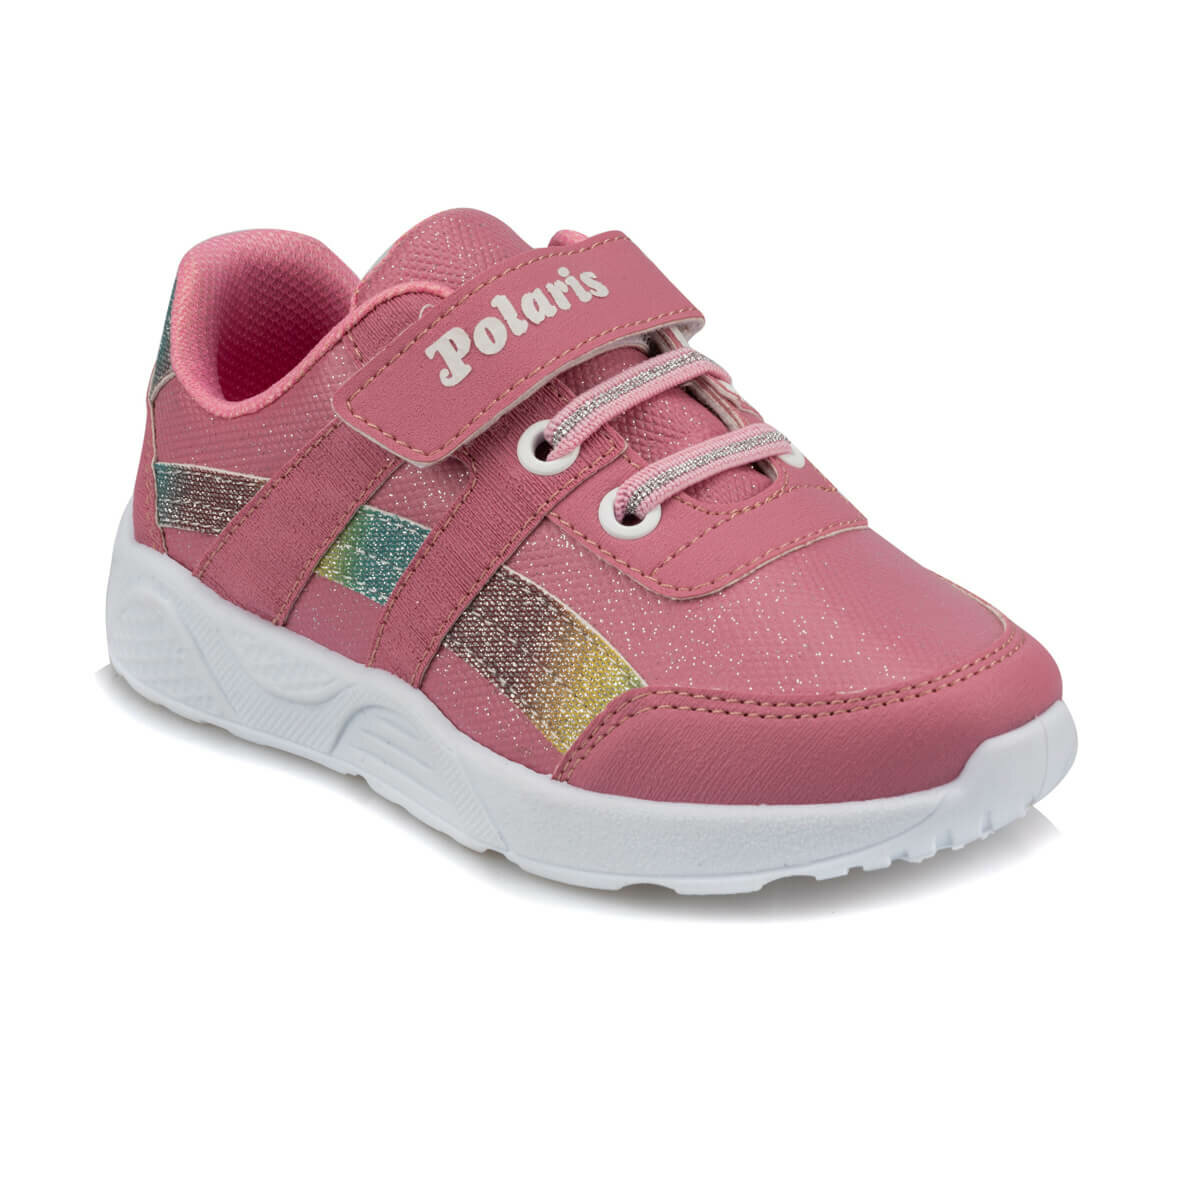 FLO 92.511784.P Pink Female Child Sports Shoes Polaris